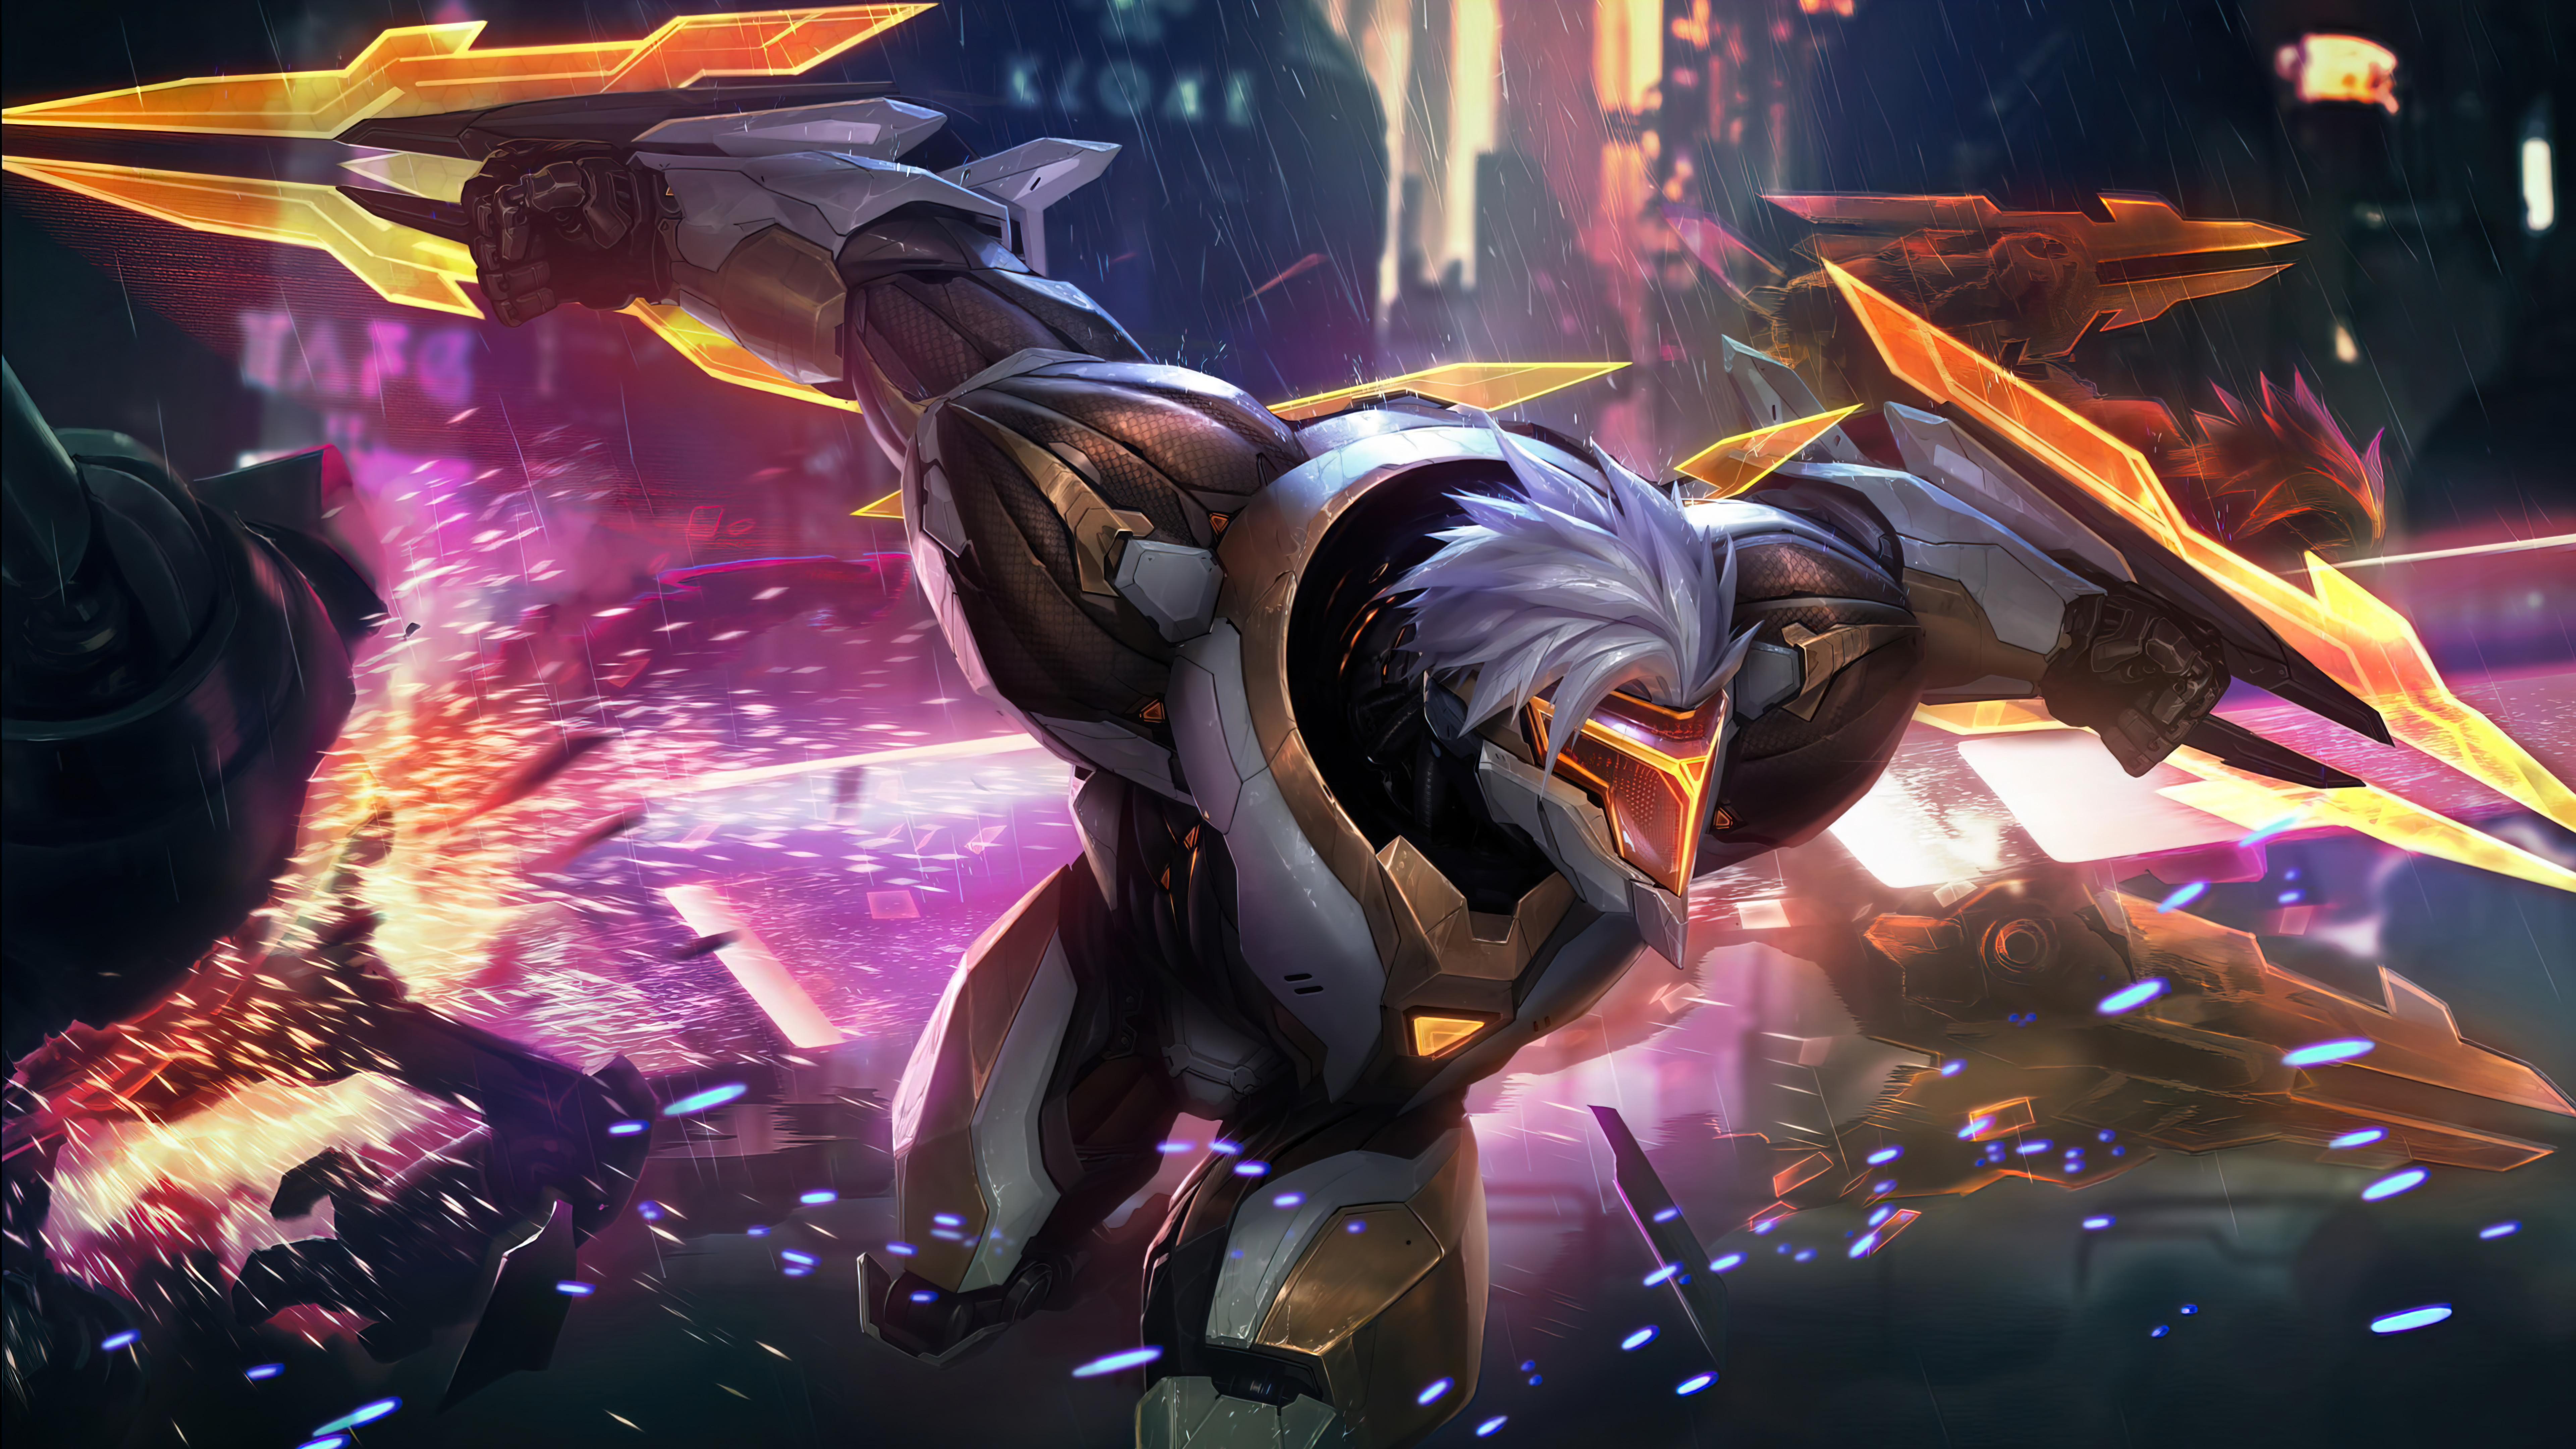 Fondos de pantalla Proyect Zed Prestige Edition League of Legends Splash Art